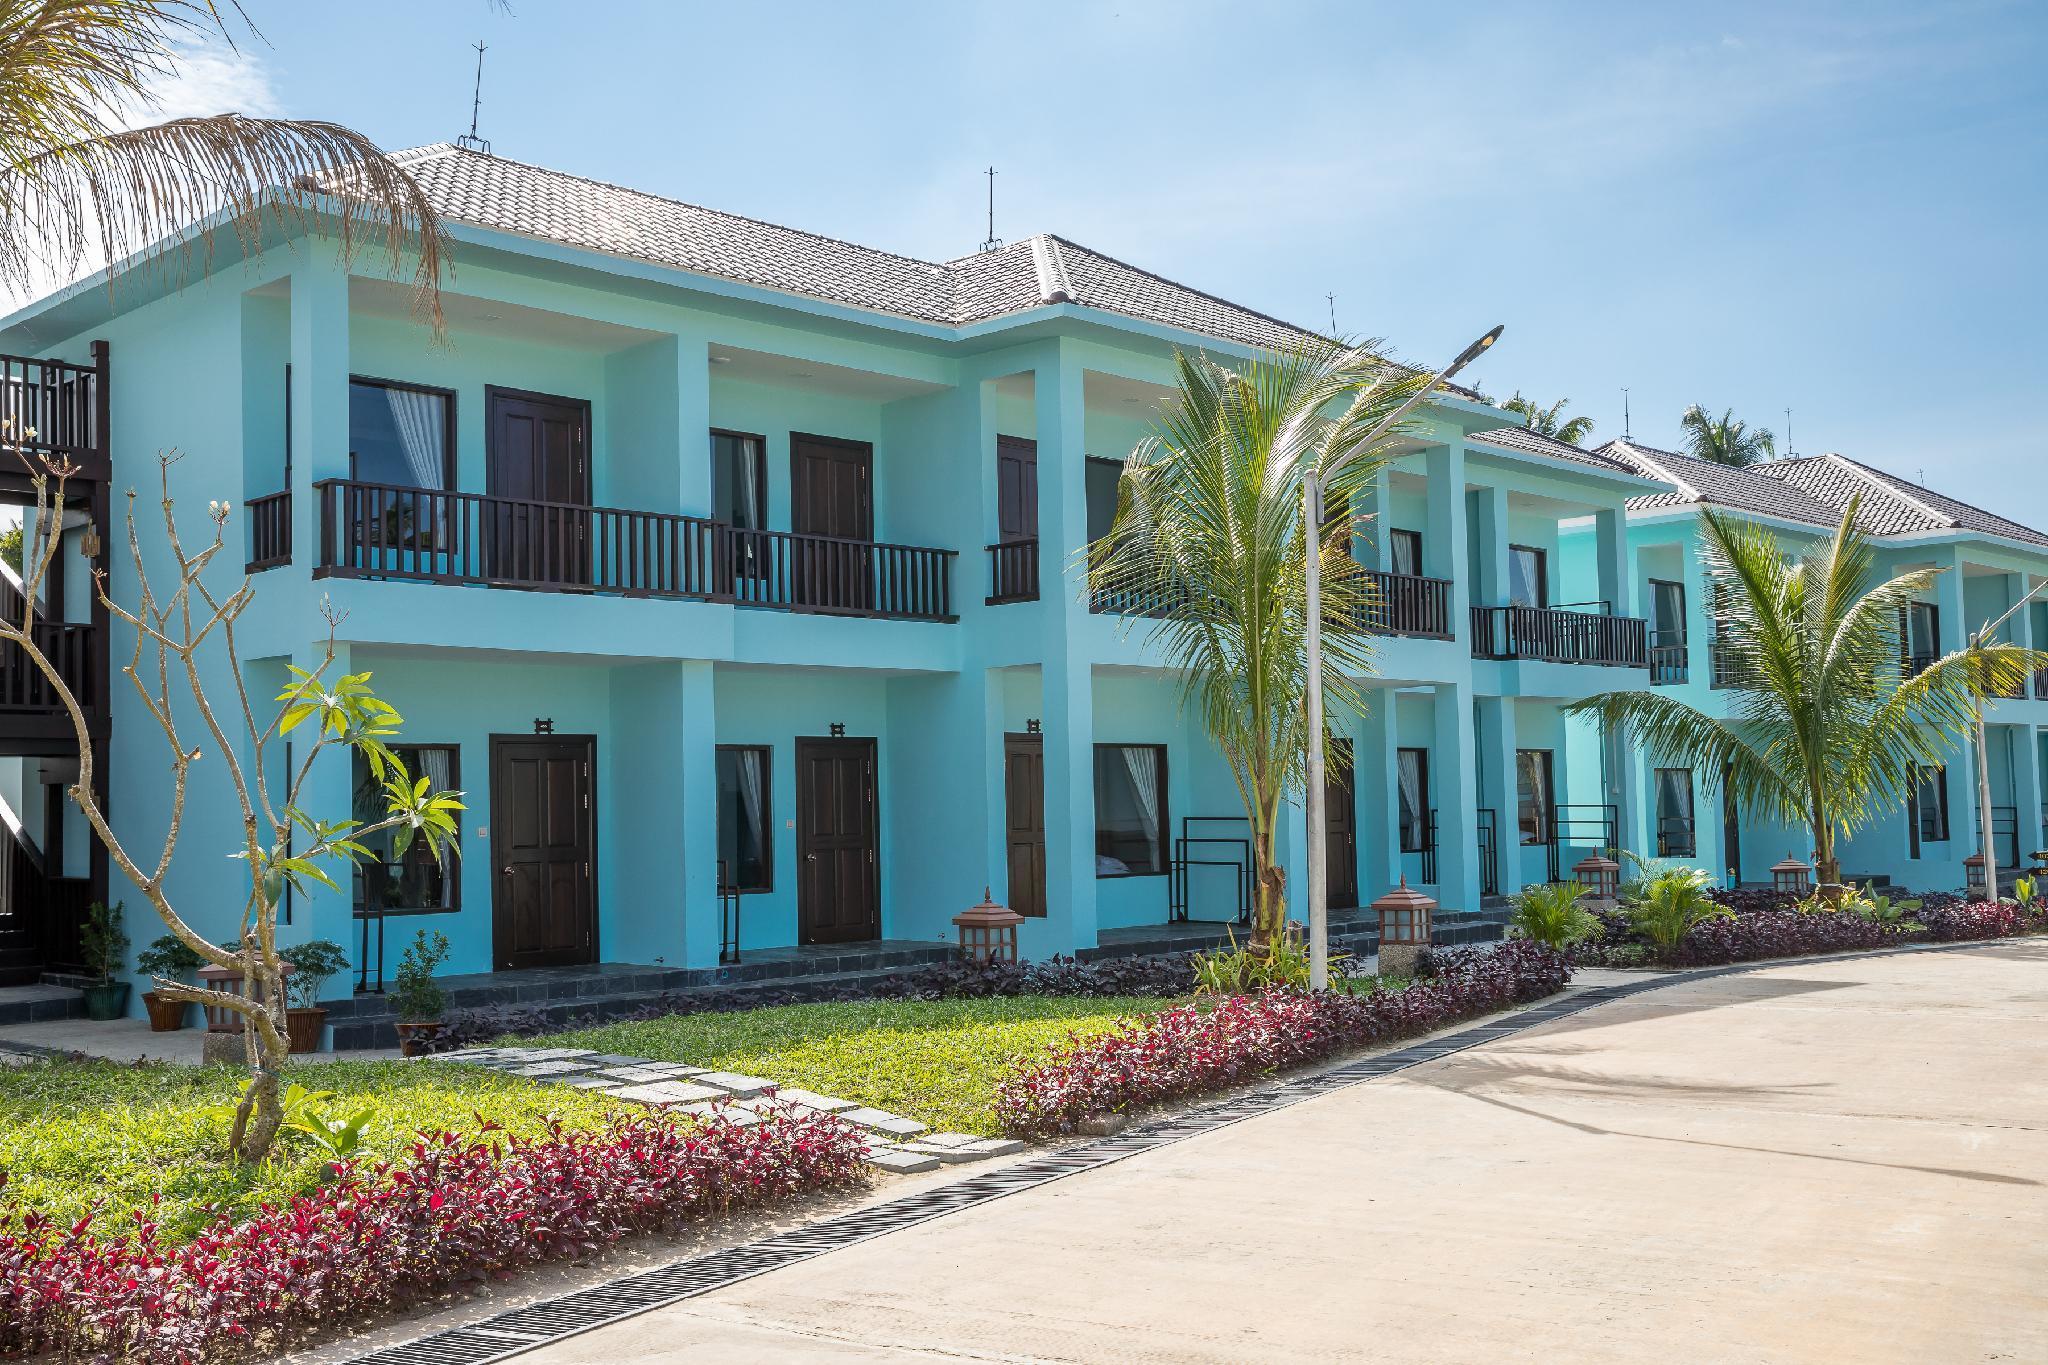 RIA HOTEL RESORT